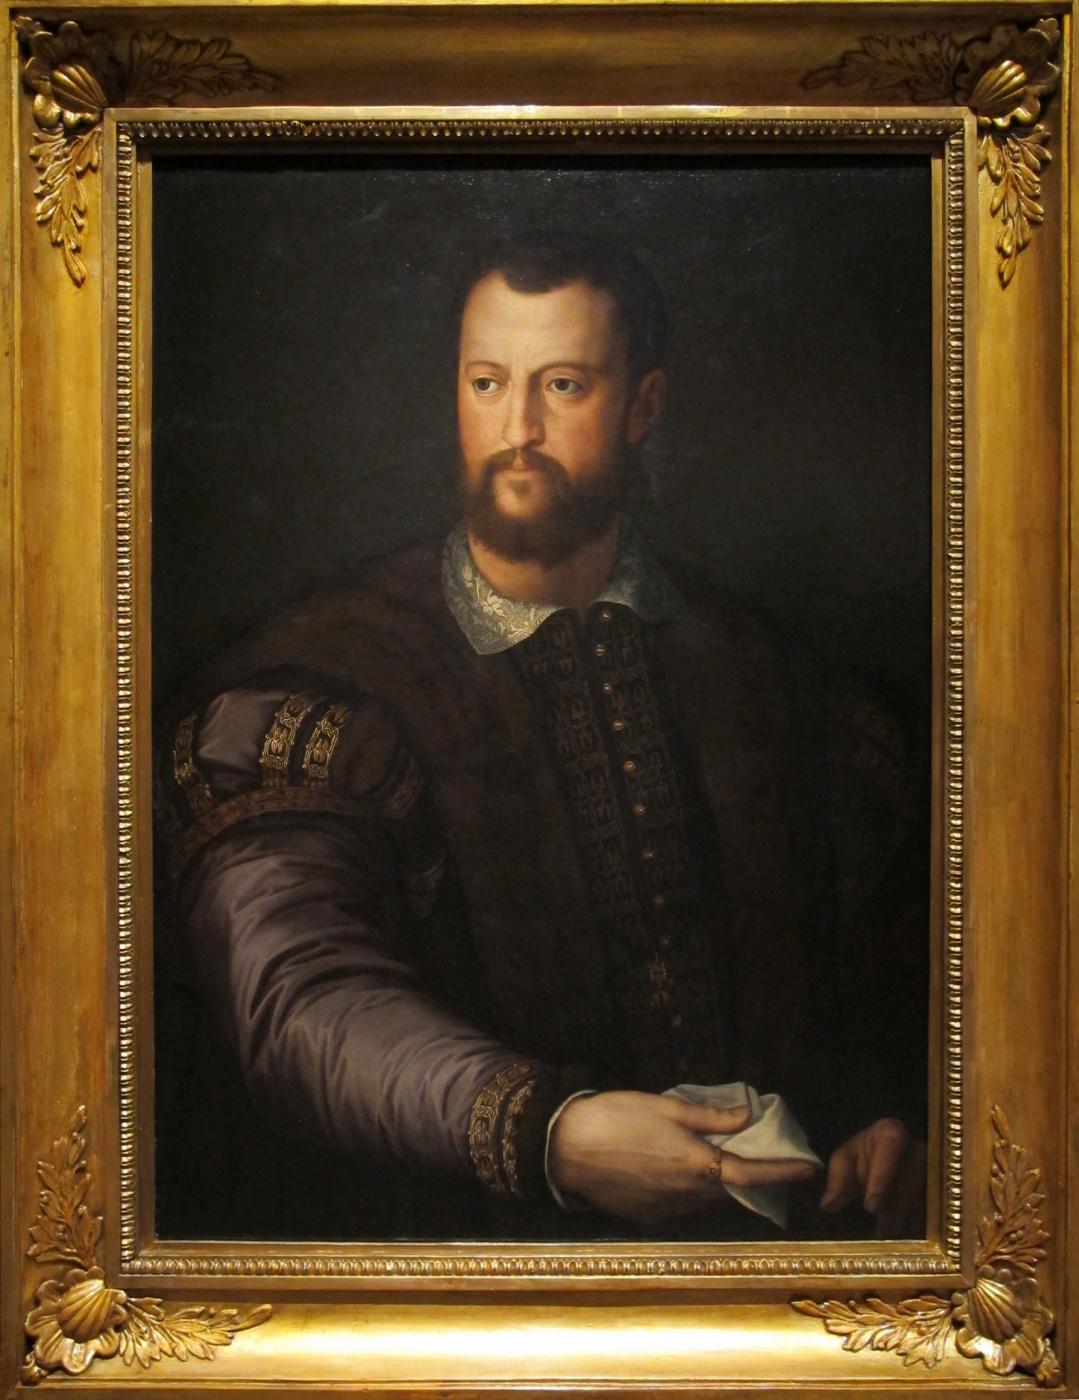 Portrait of Cosimo Medici, Grand Duke of Tuscany